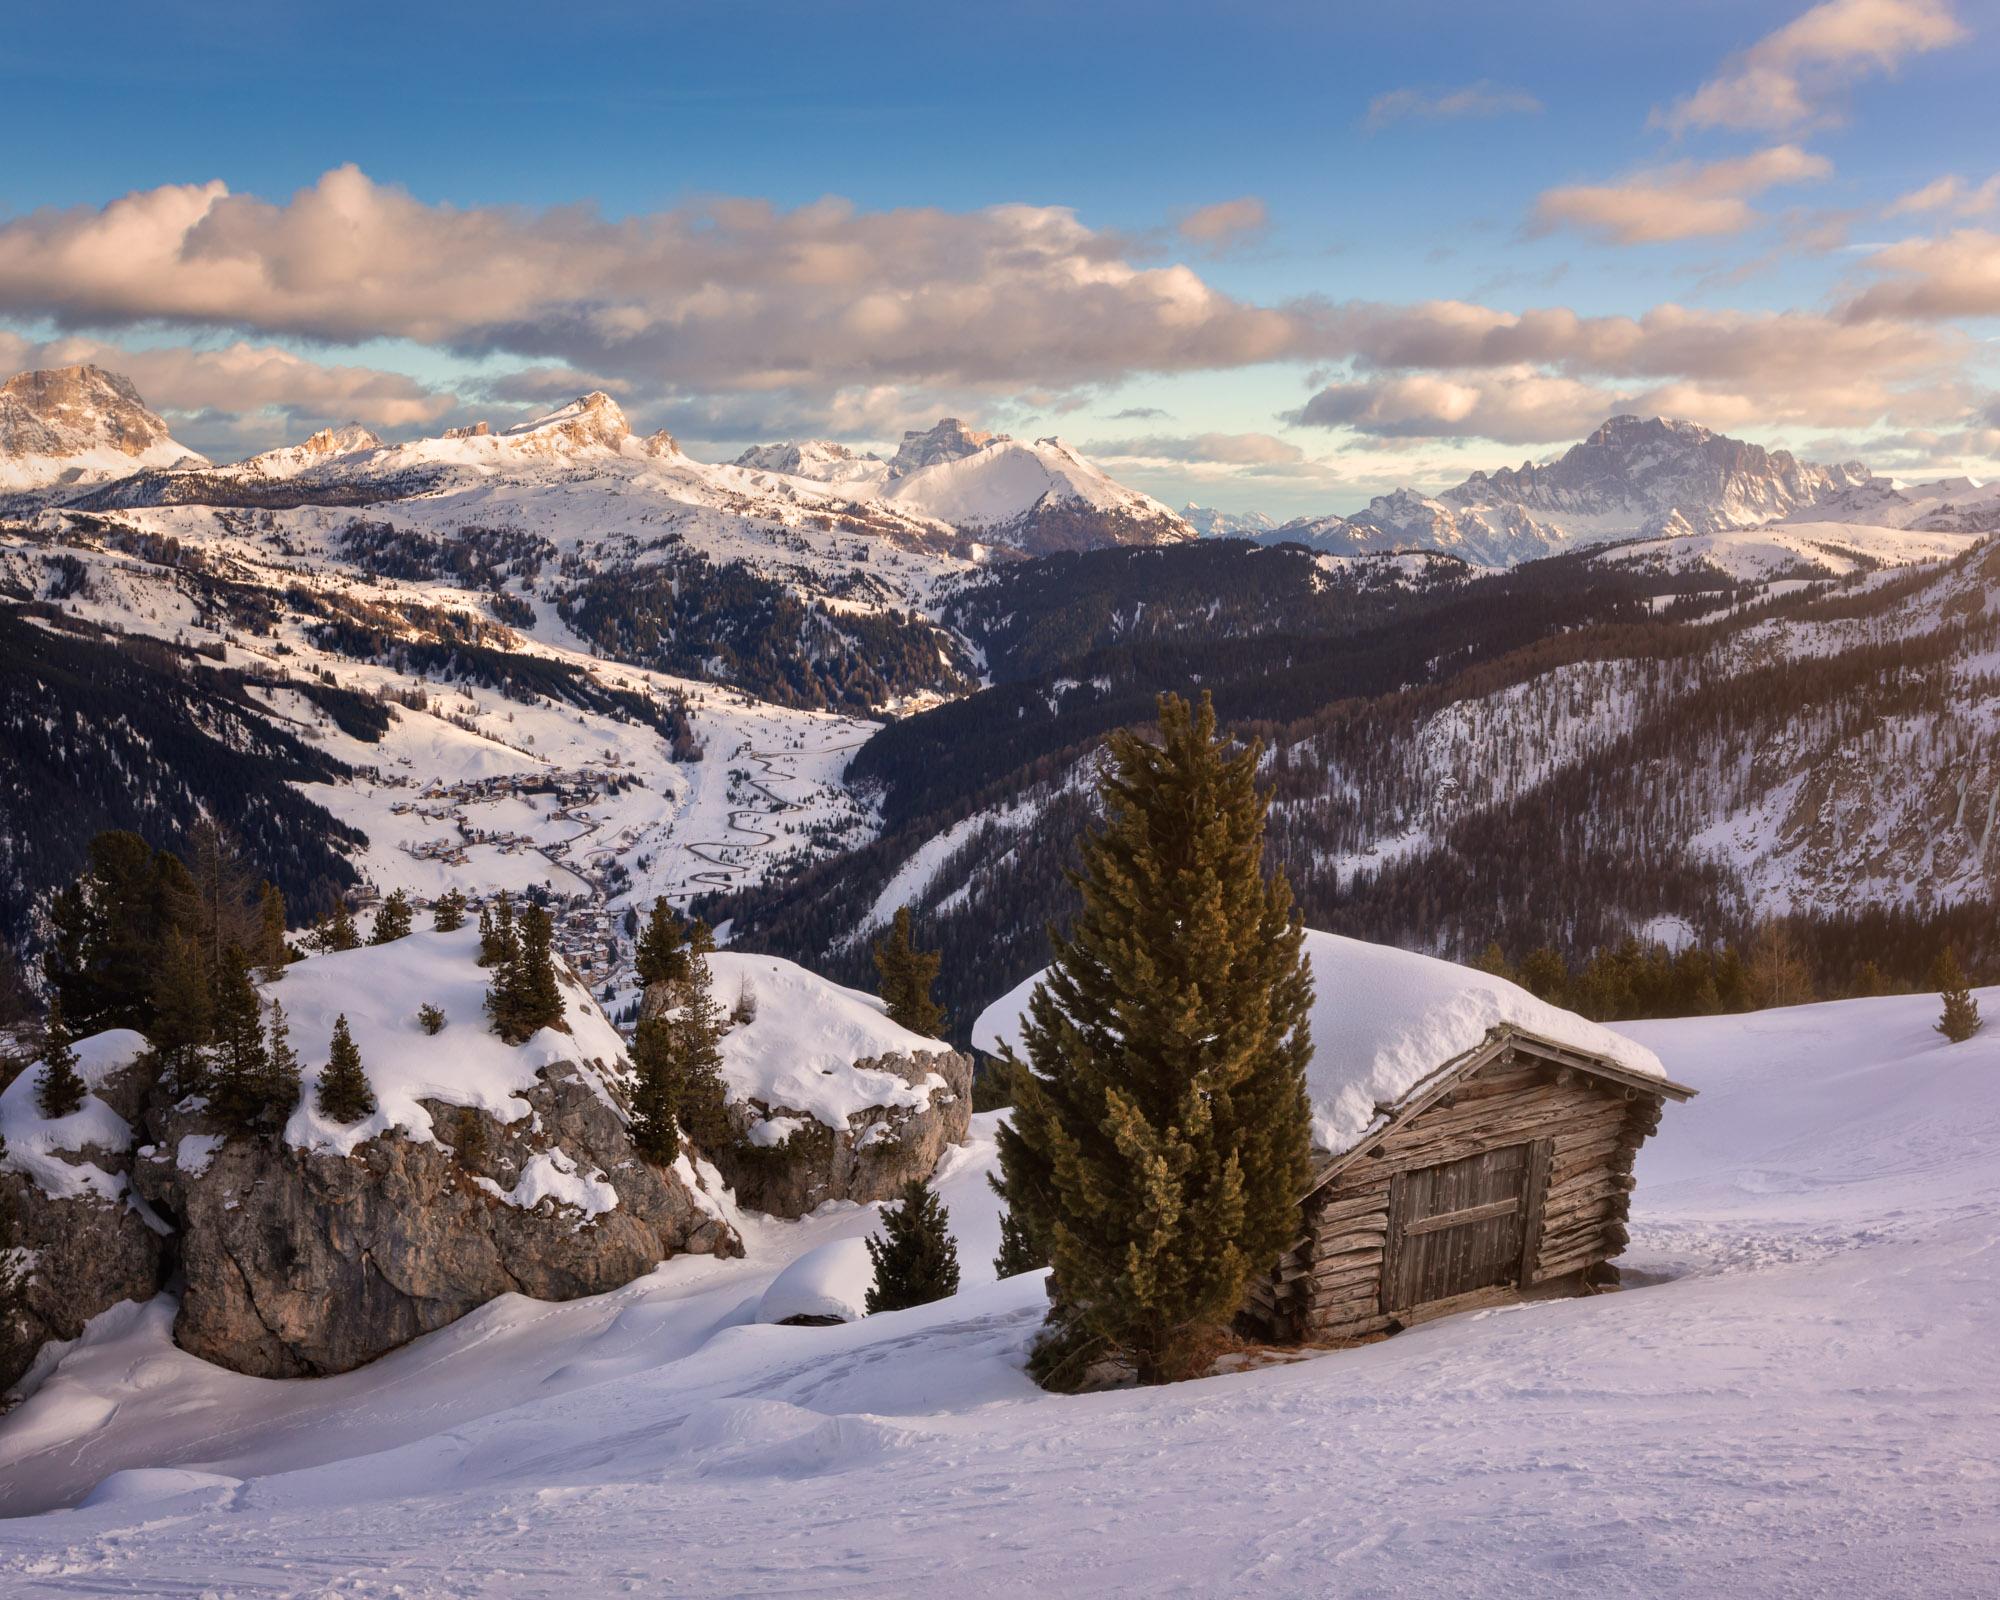 Passo Campolongo Valley, Ski Resort of Arabba, Dolomites, Italy